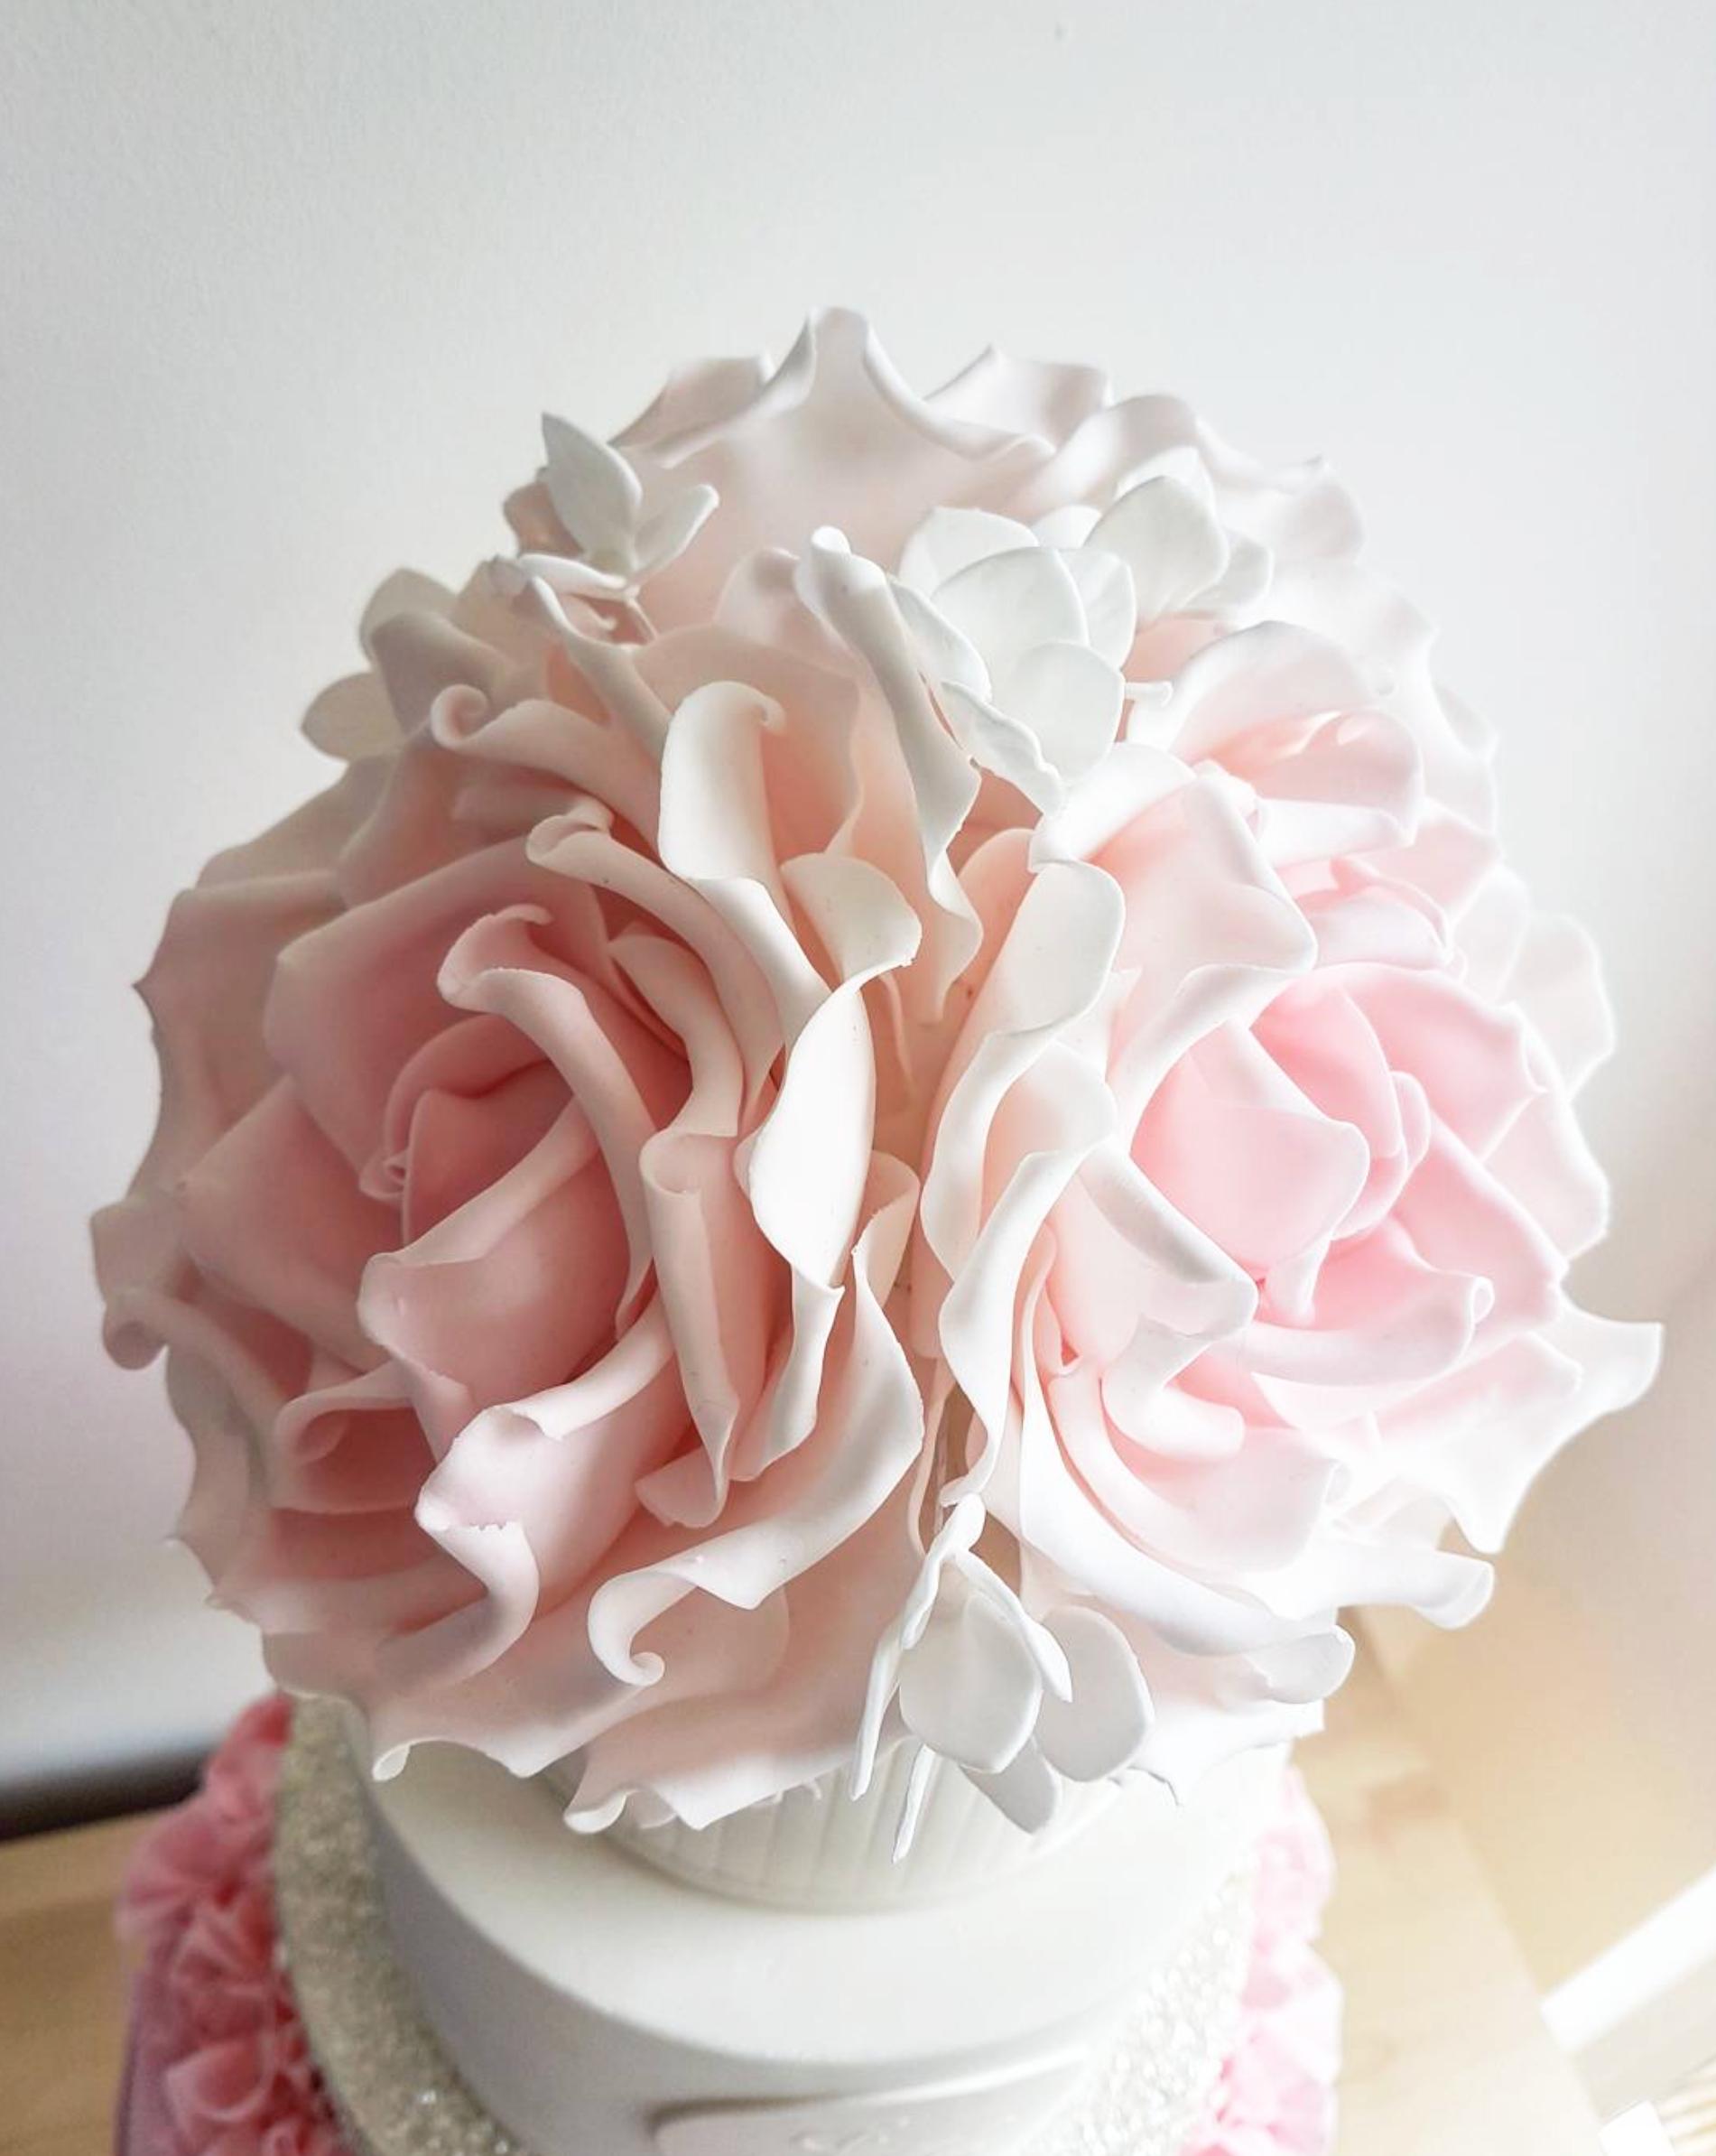 DOTTY ROSE CAKE DESIGN SUGARCRAFT FLOWERS PEONIES.png